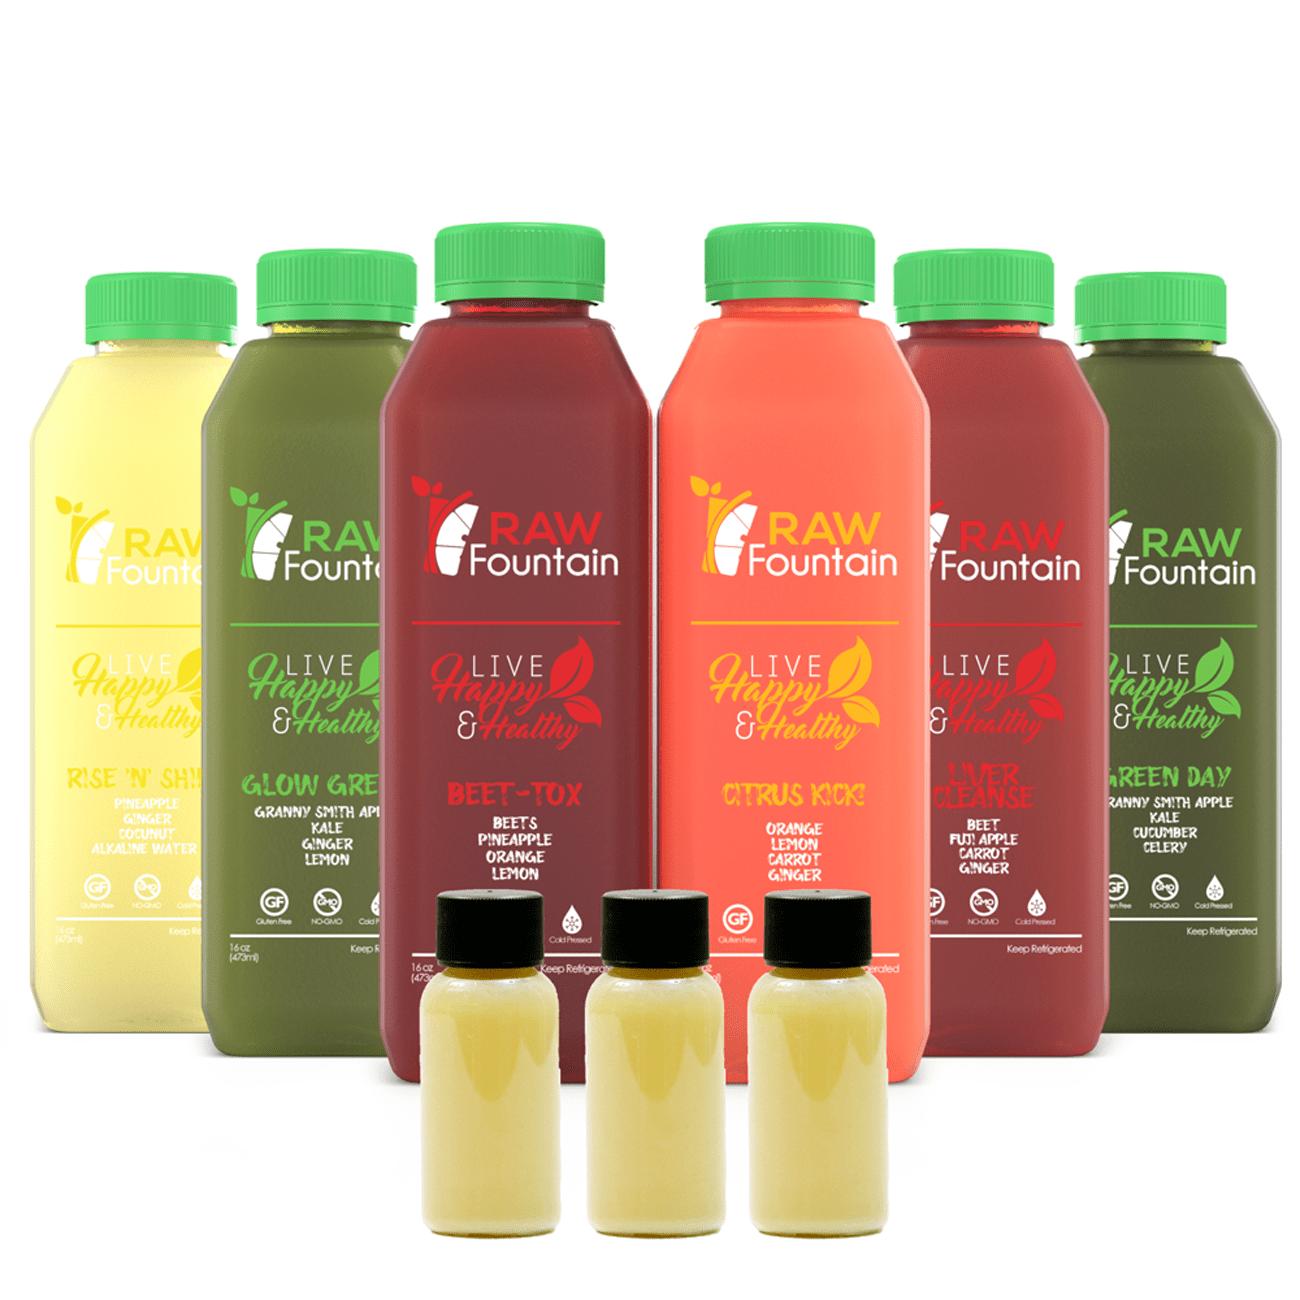 5 Day Juice Cleanse Detox 30 Bottles